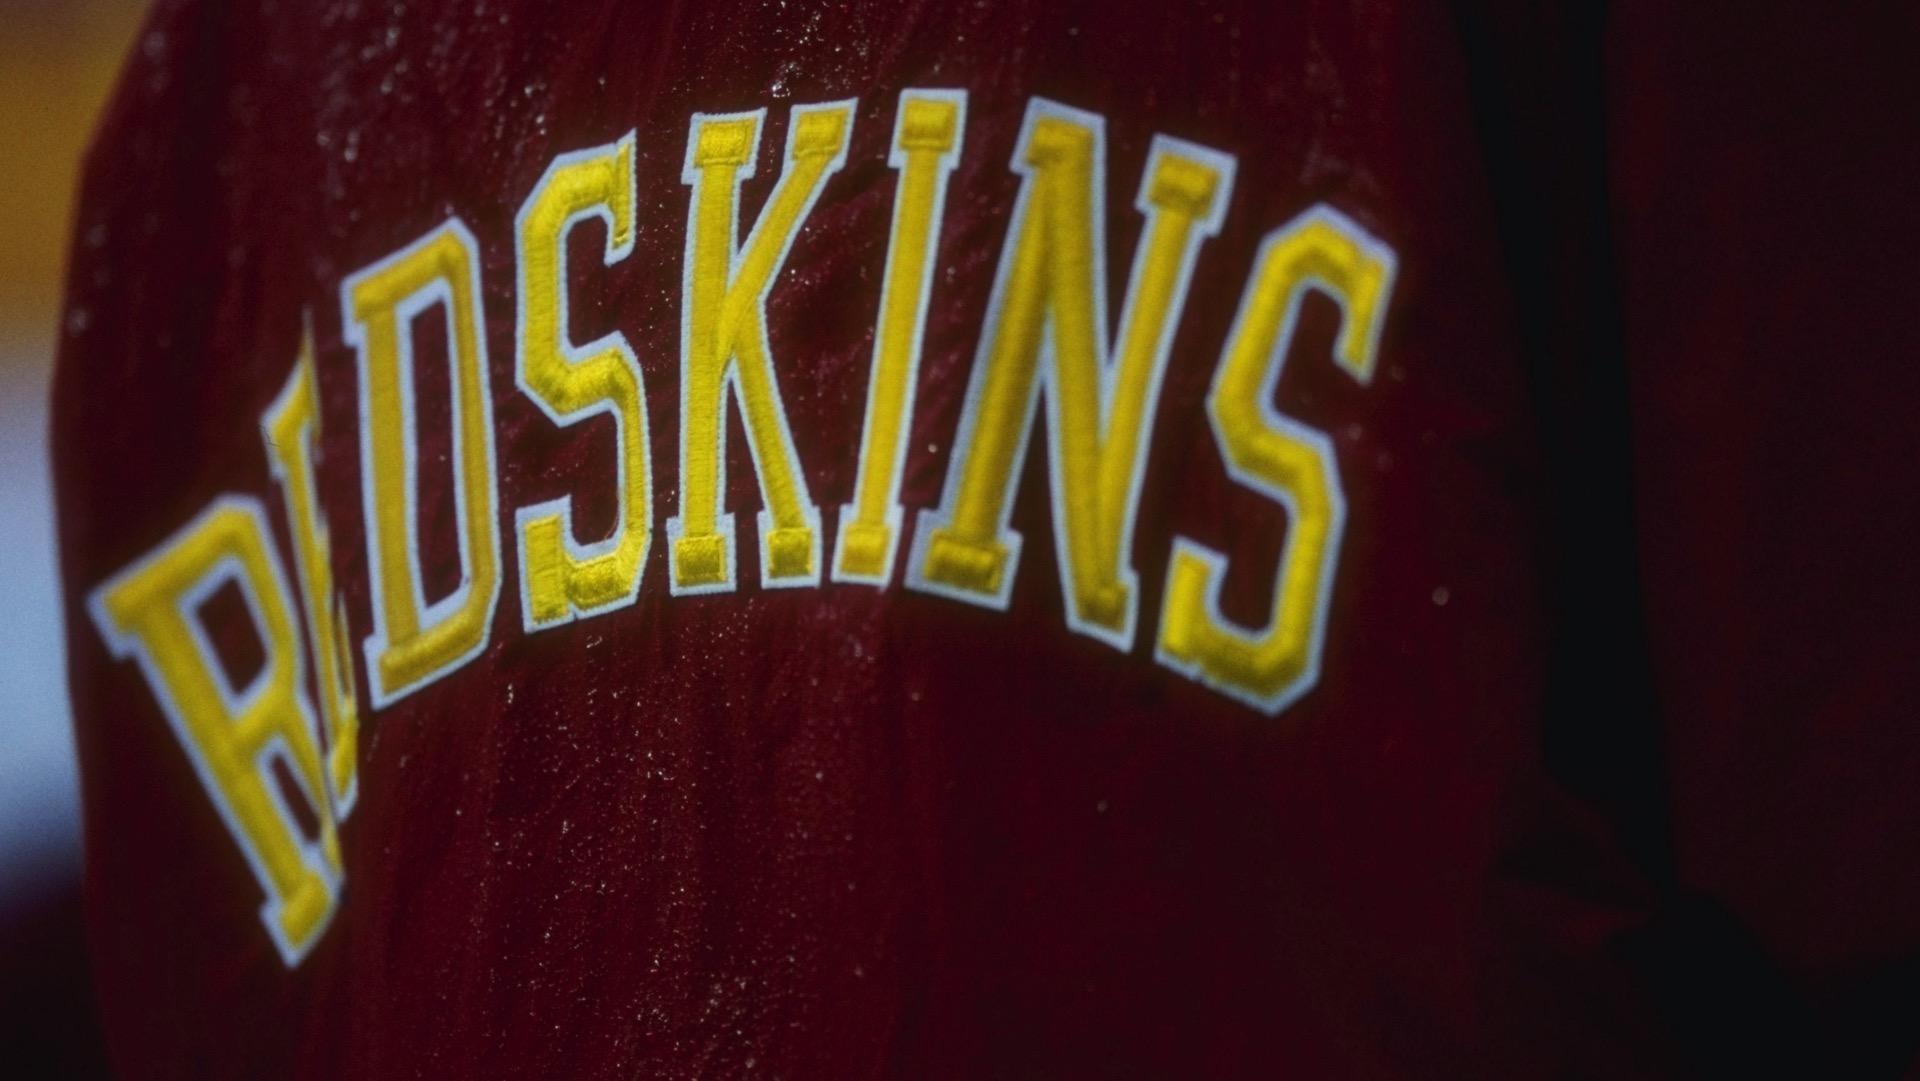 redskins-31615-us-news-getty-FTR